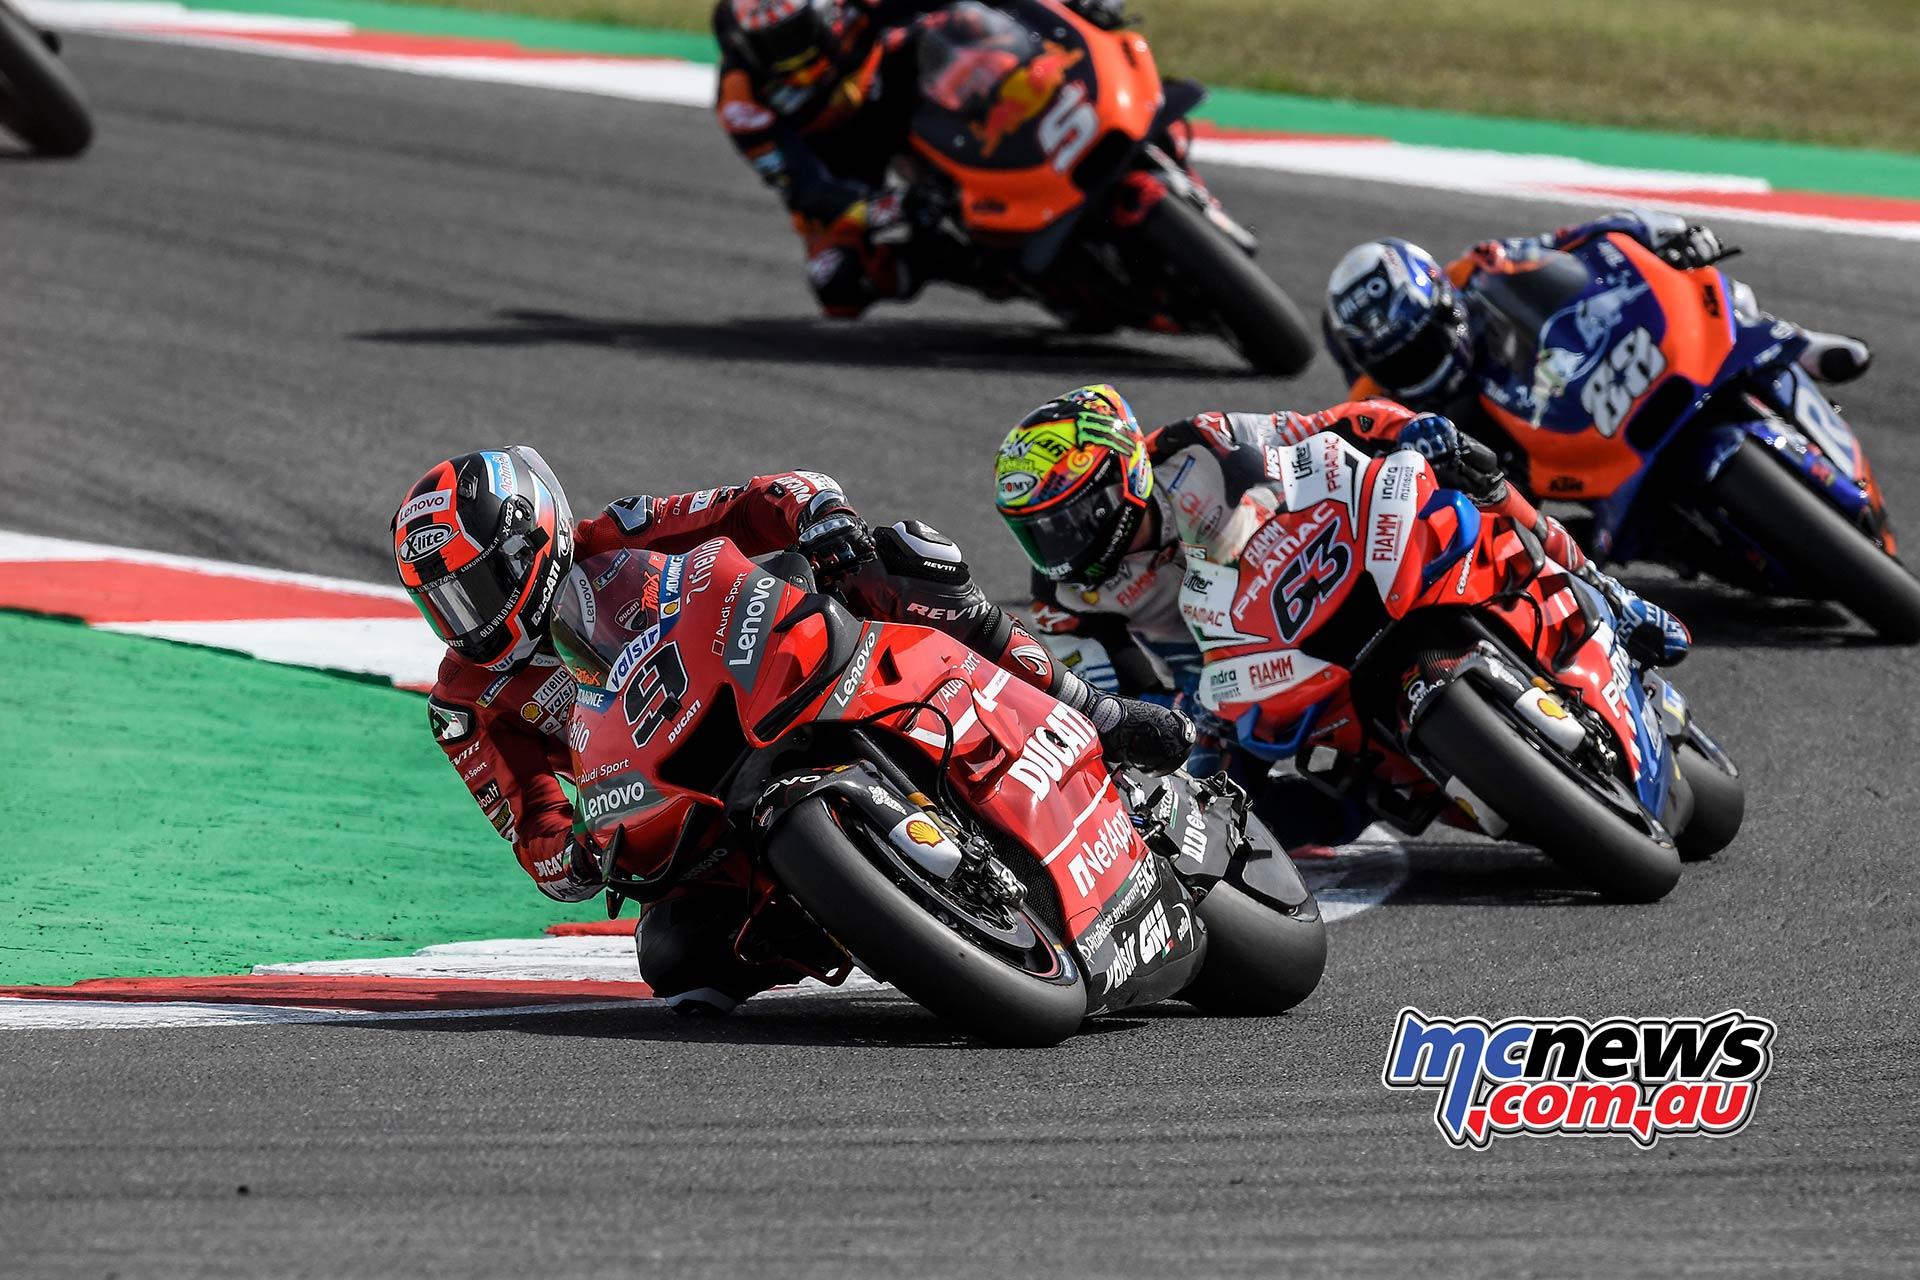 MotoGP Rnd Misano Petrucci Bagnaia